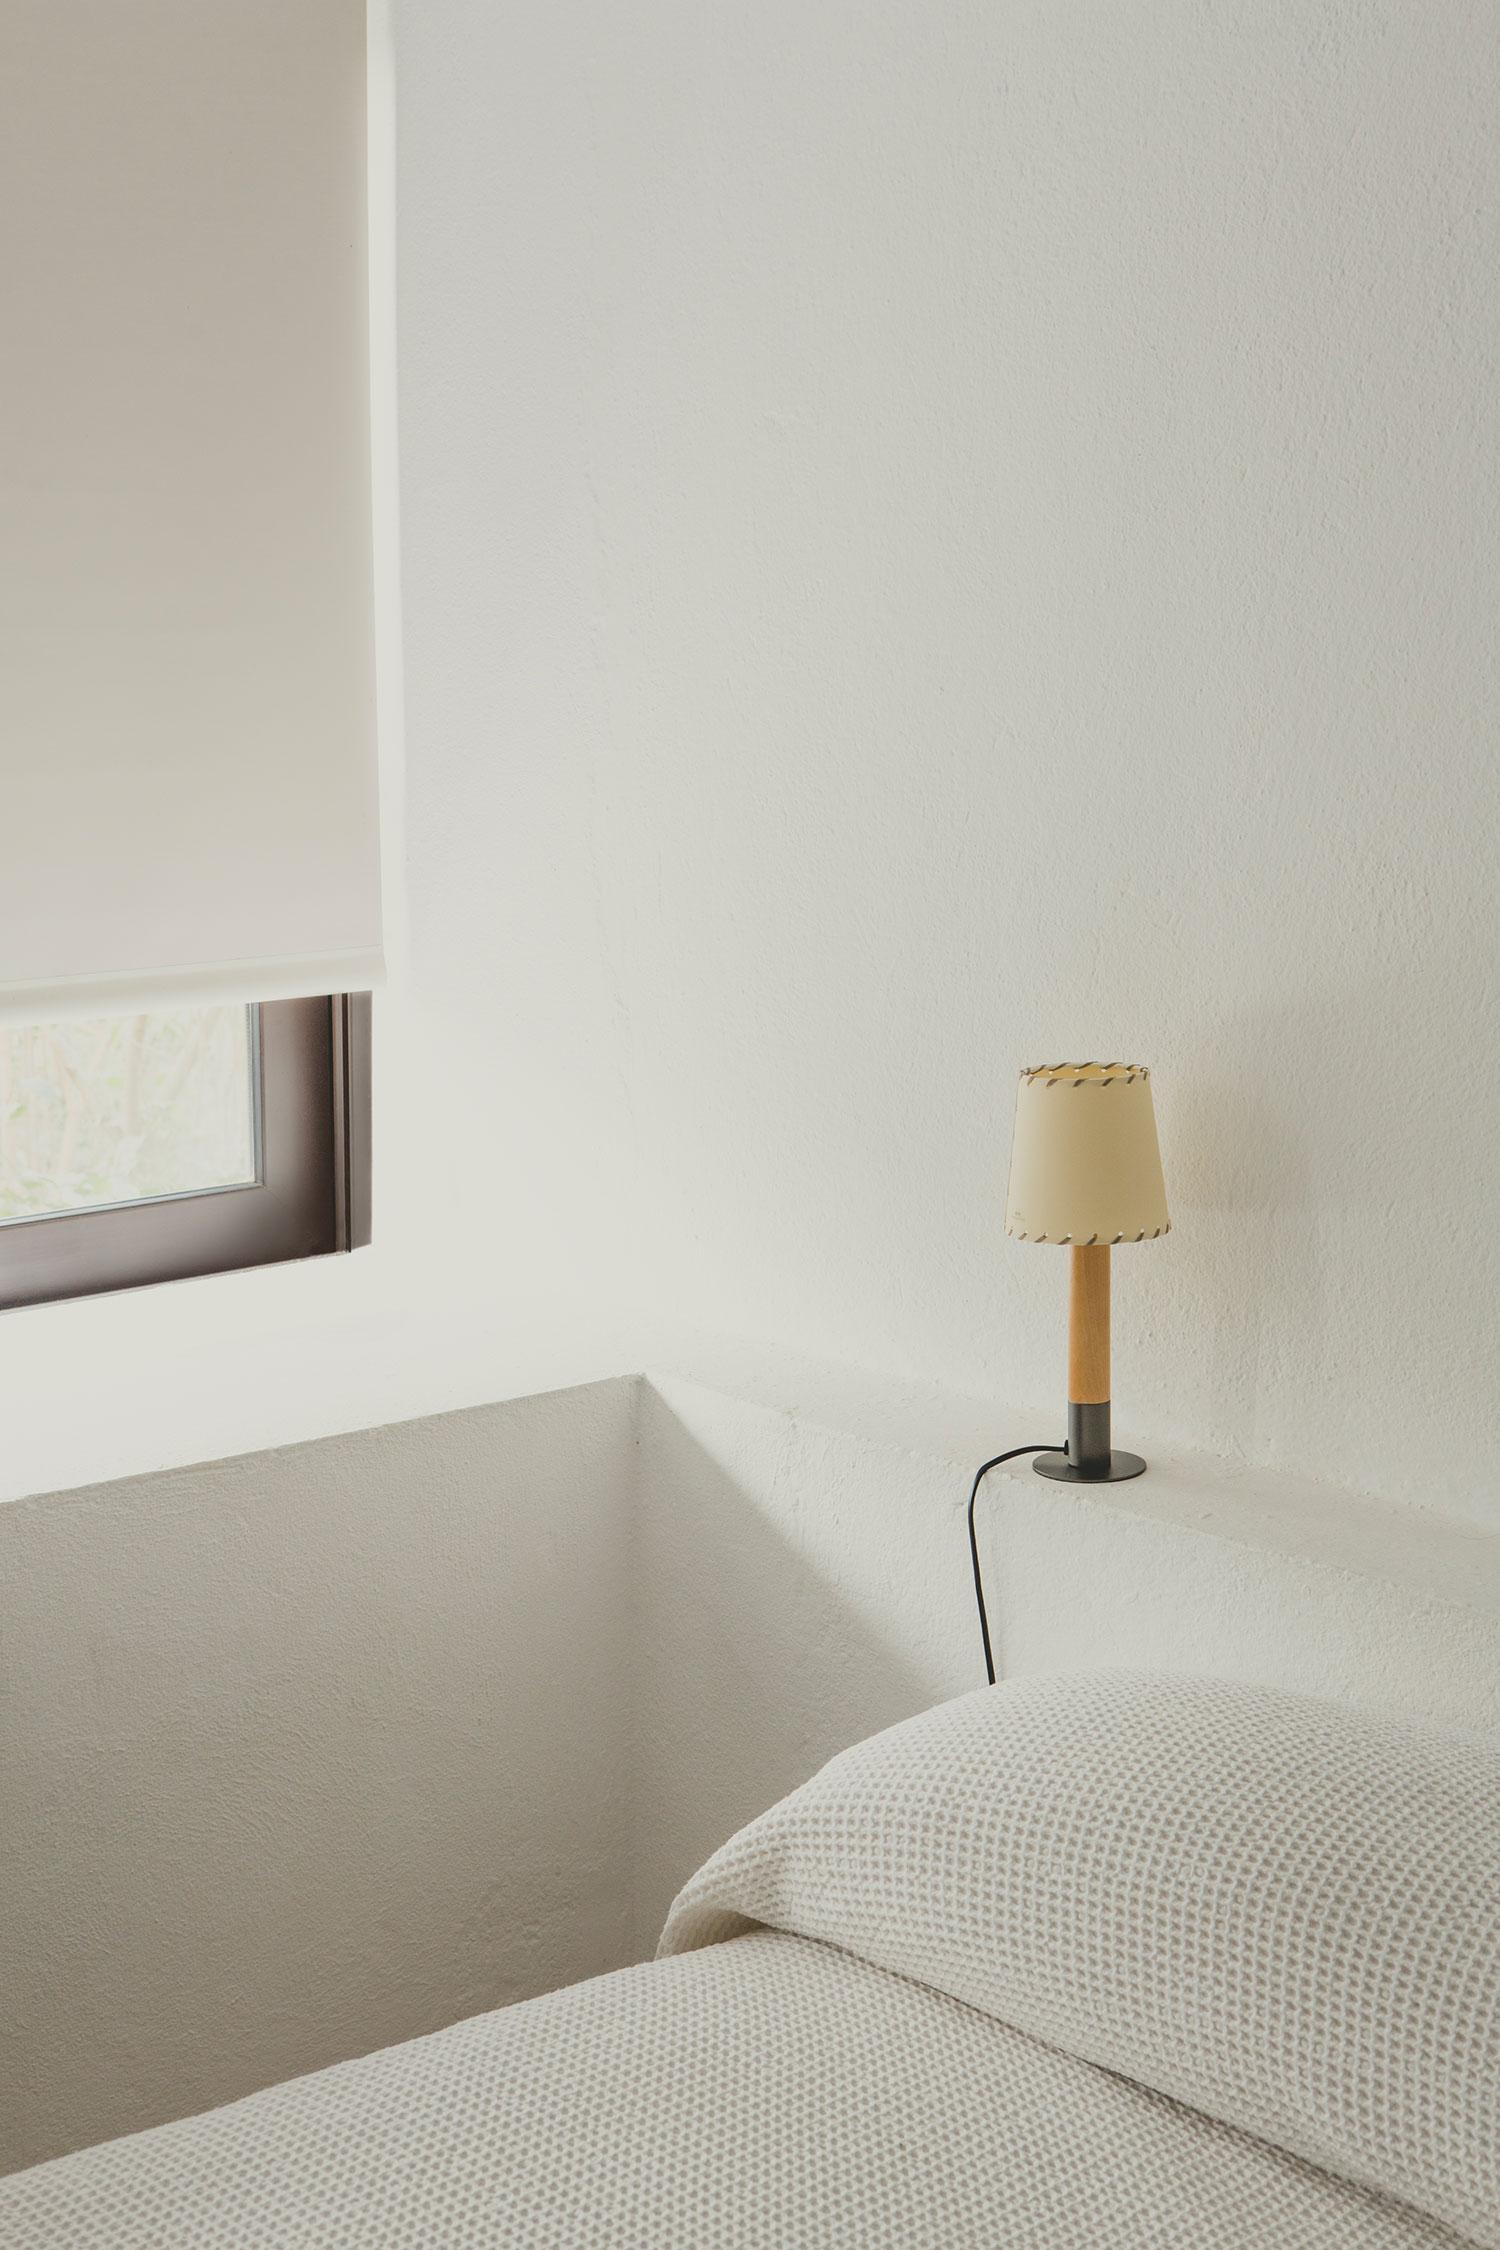 SANTACOLE_TABLE_LAMPS_Basica_Minima_Basica_minima_Pericas__Carlos_1-web.jpg